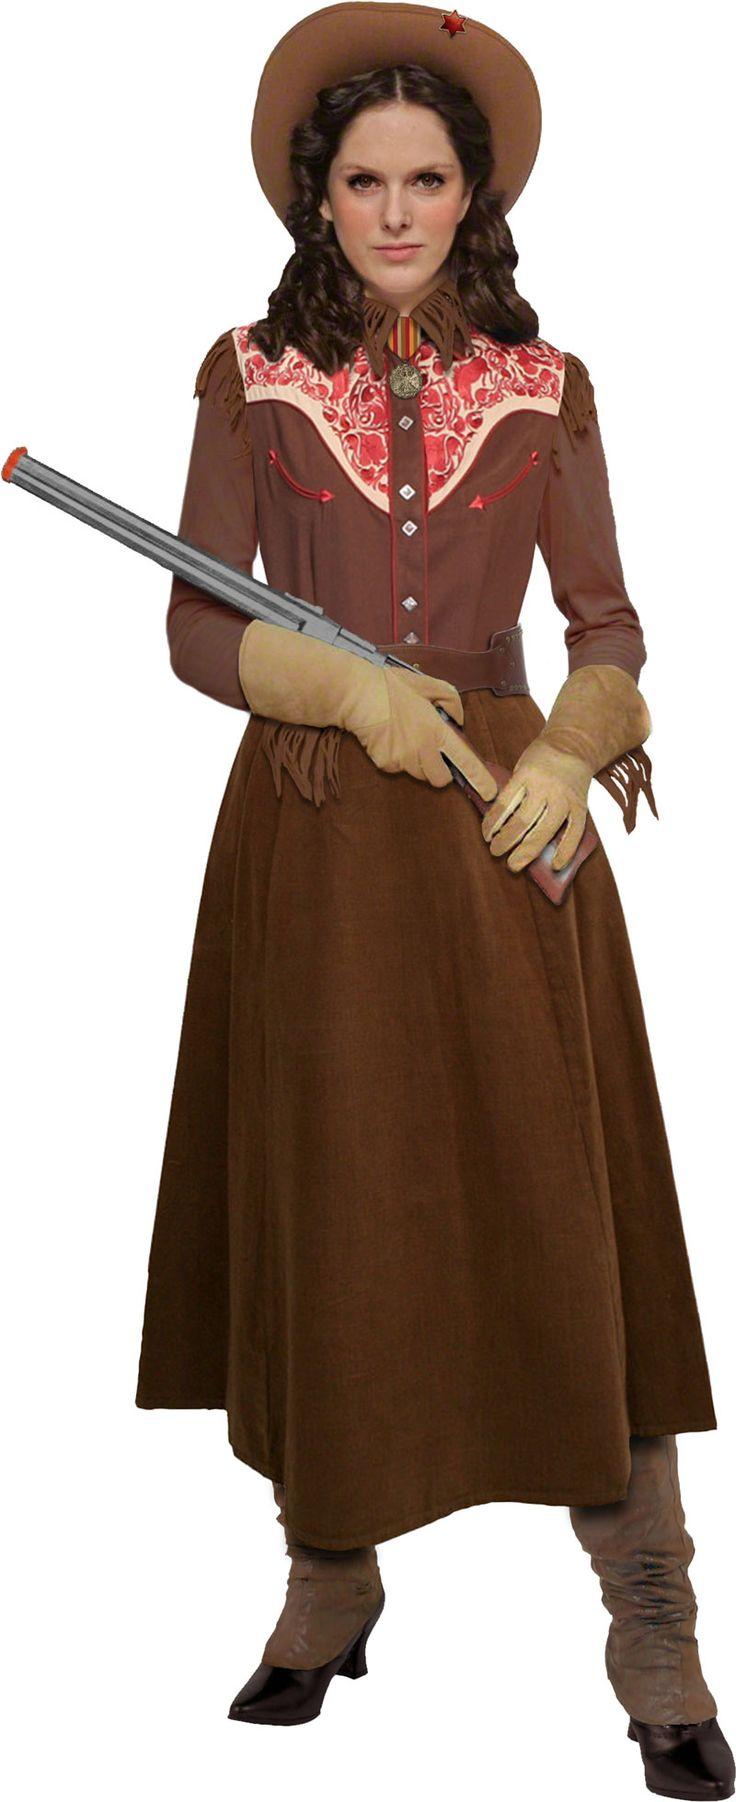 annie oakley costume | Annie Oakley | Take Back Halloween!